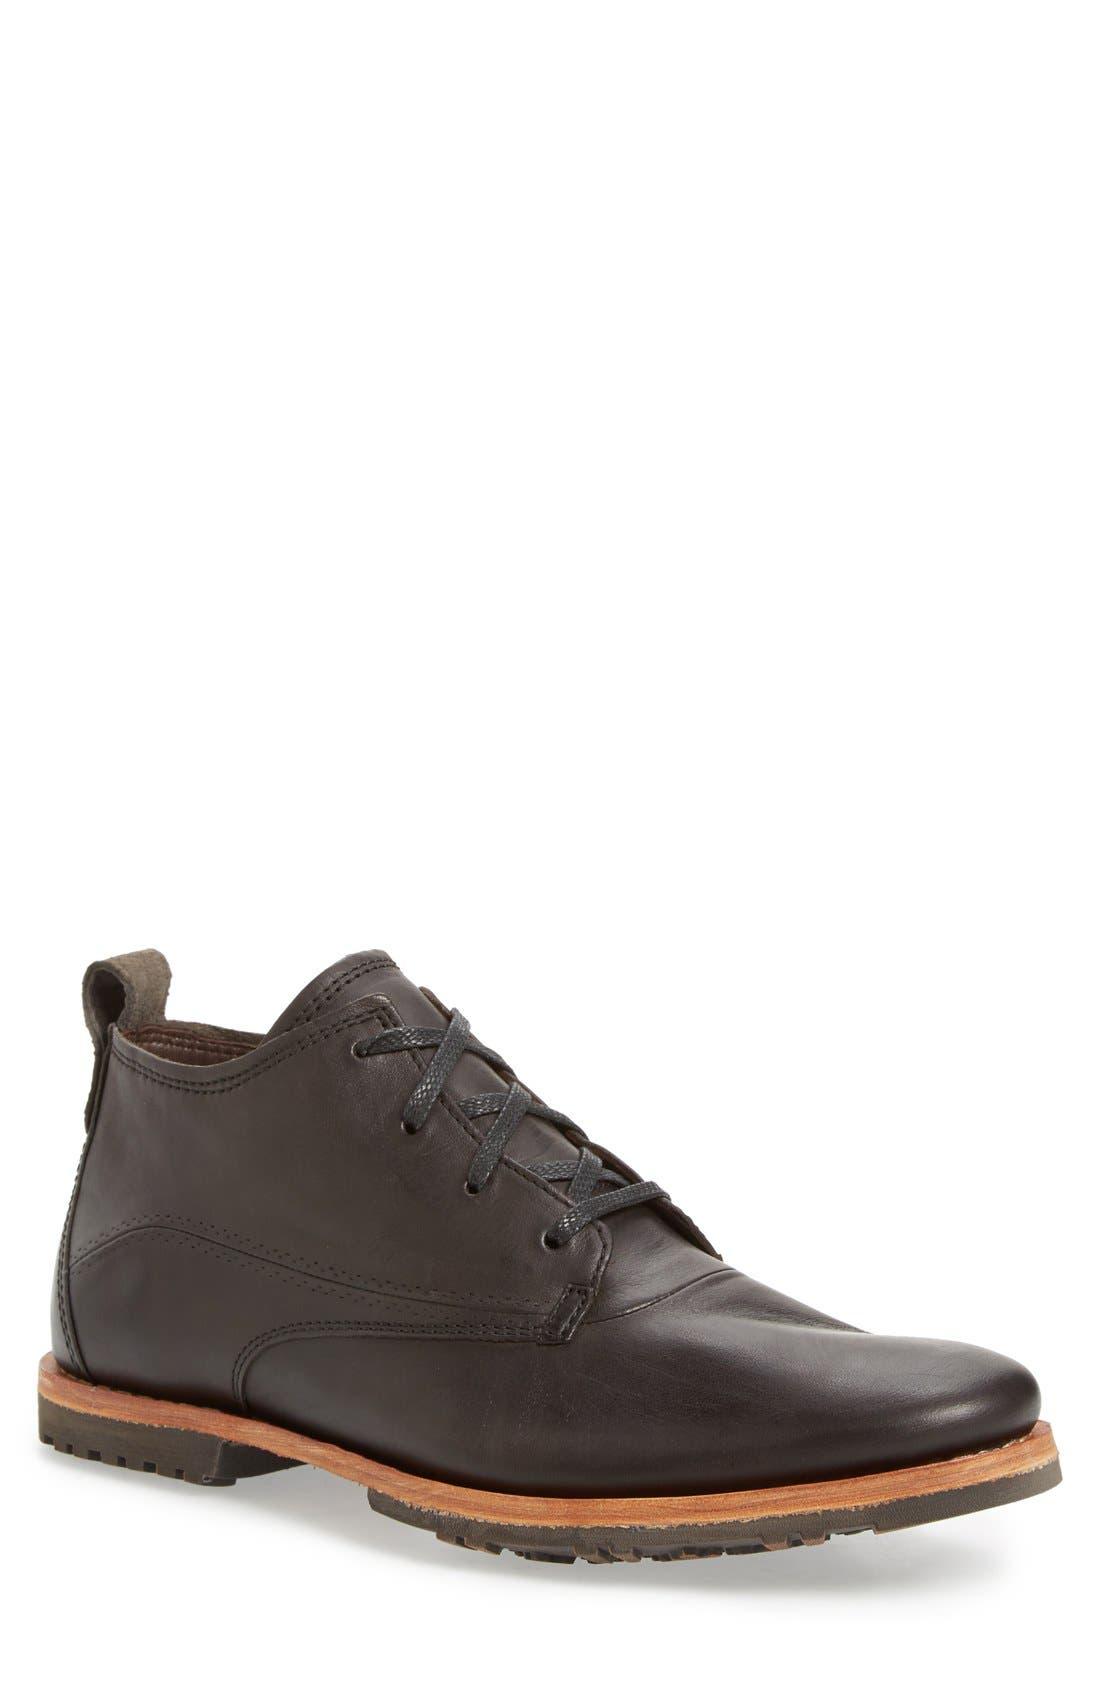 Alternate Image 1 Selected - Timberland 'Bardstown' Chukka Boot (Men)